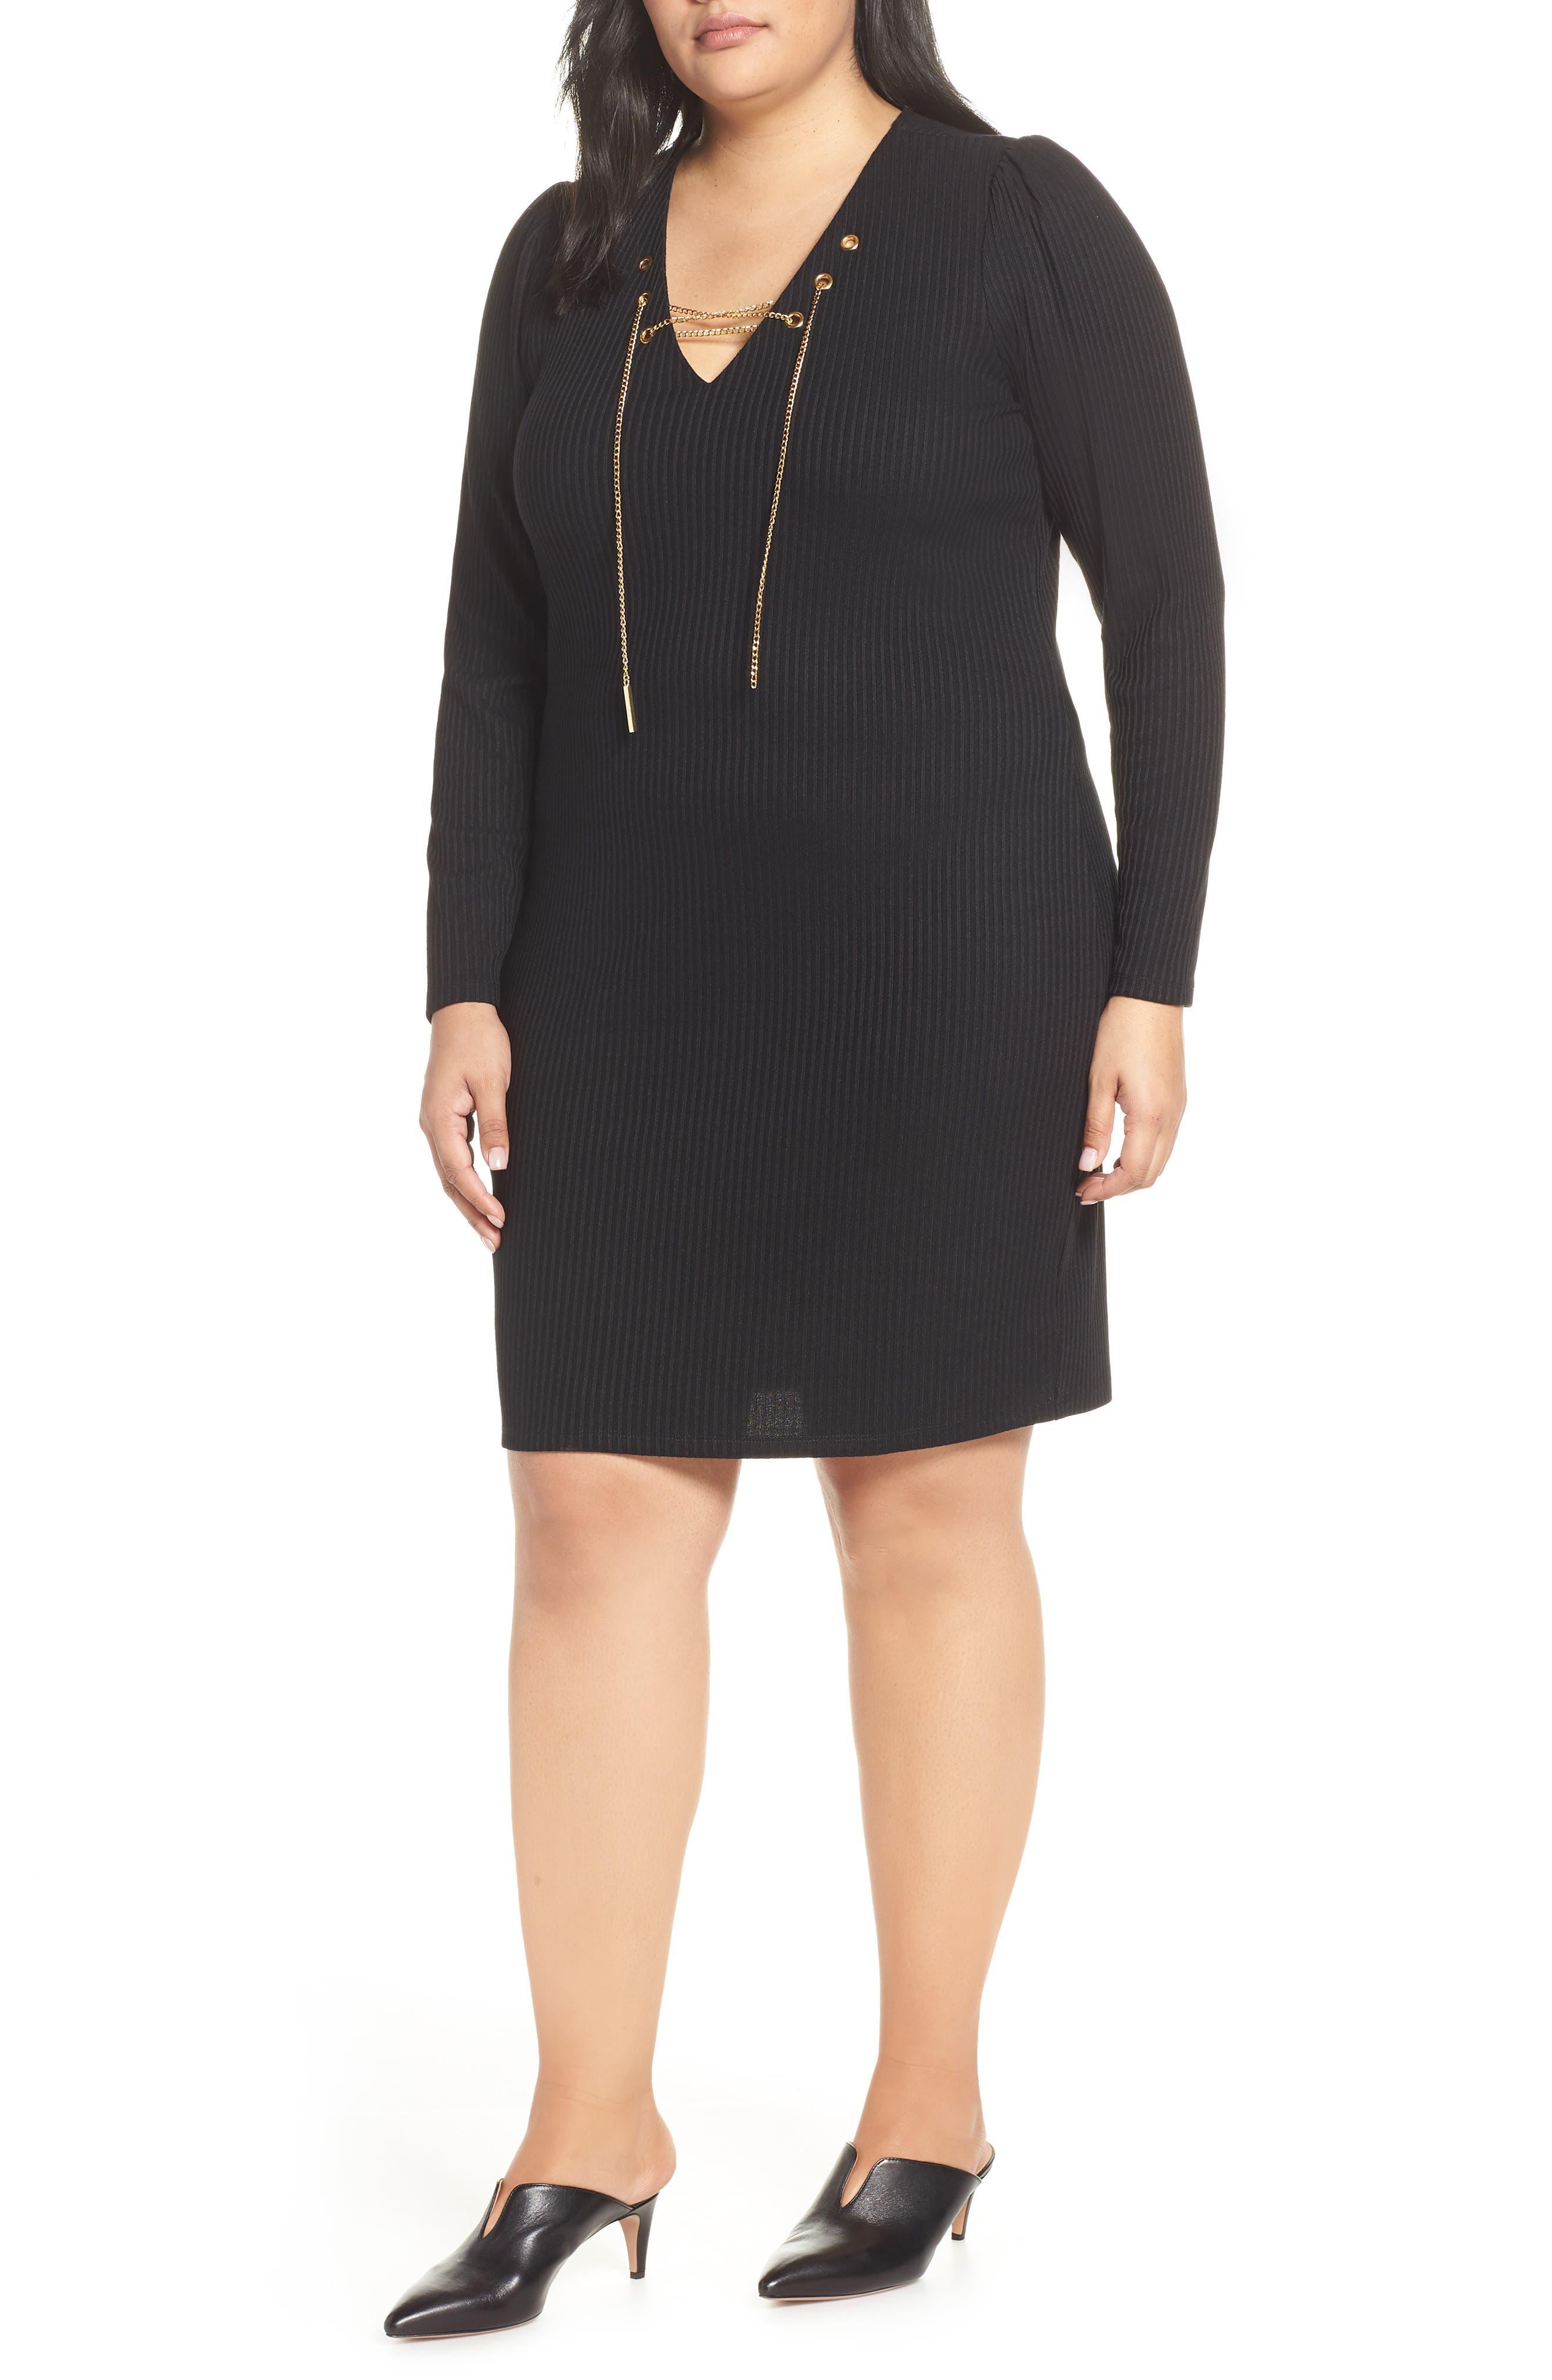 MICHAEL MICHAEL KORS, Chain Lace-Up V-Neck Sweater Dress, Main thumbnail 1, color, 001